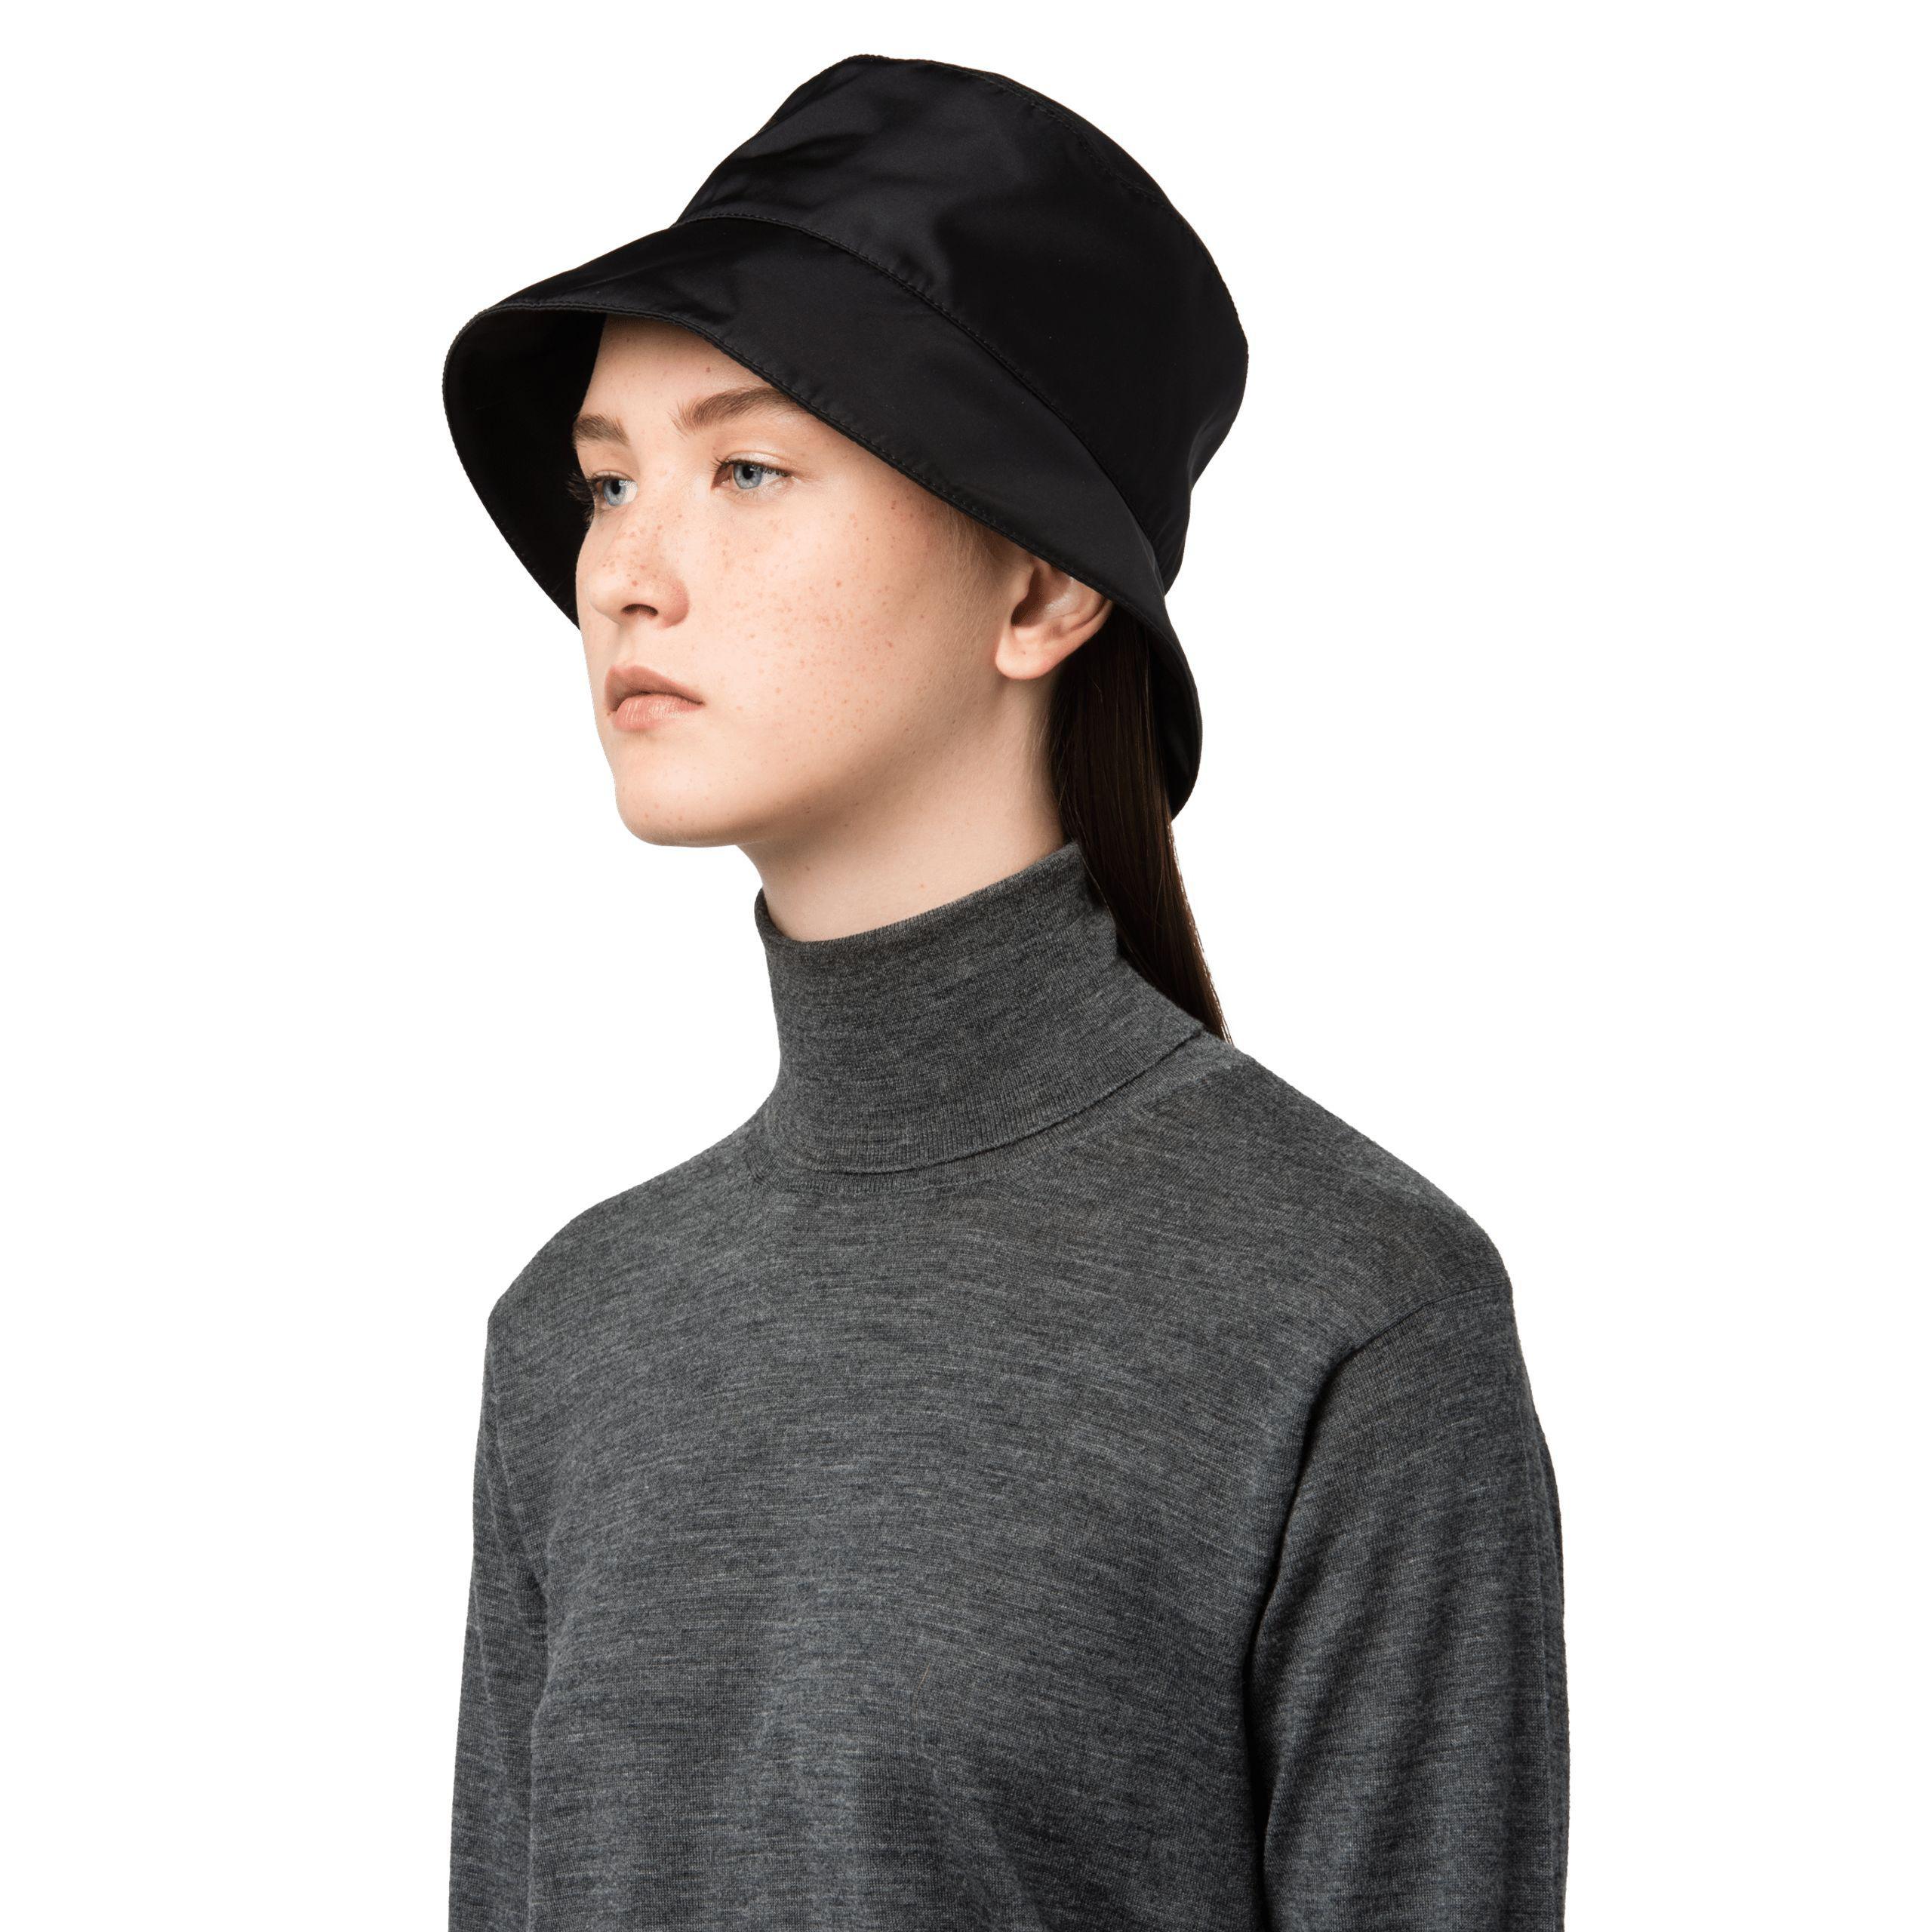 Lyst - Prada Nylon Rain Hat in Black 4575c1a912eb